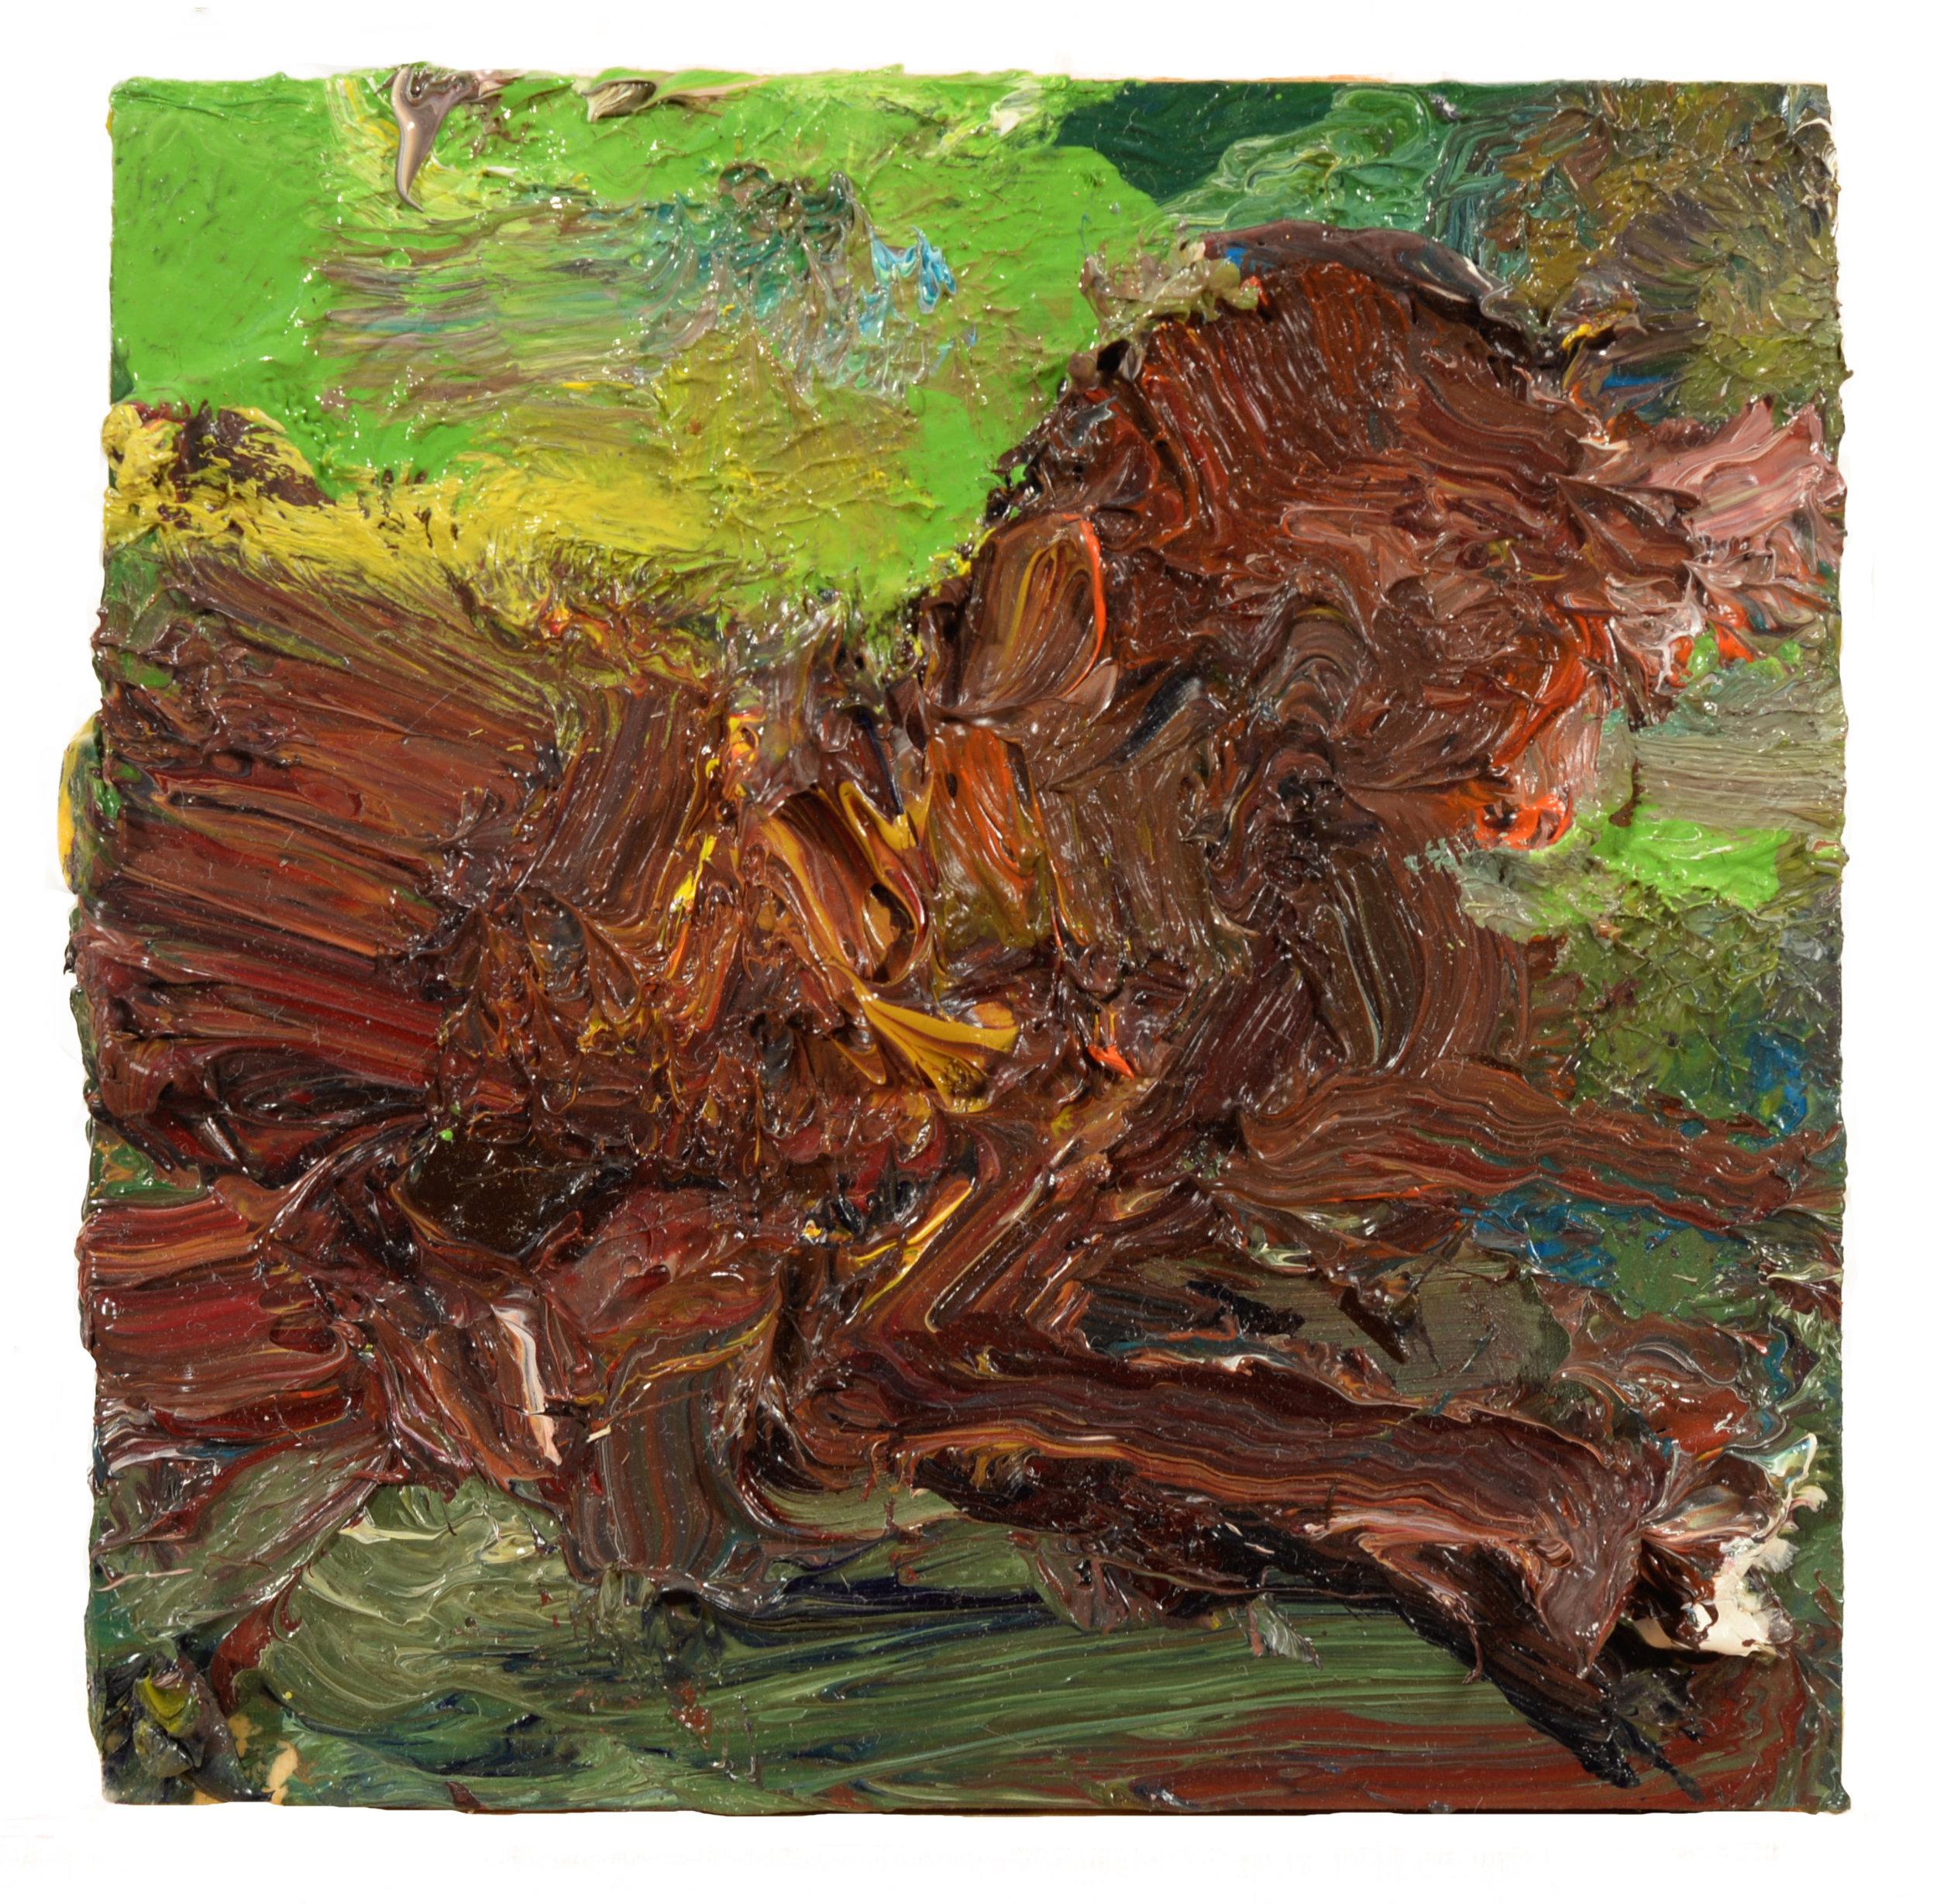 """Chocolate Labrador outdoors"" oil on panel 2017"